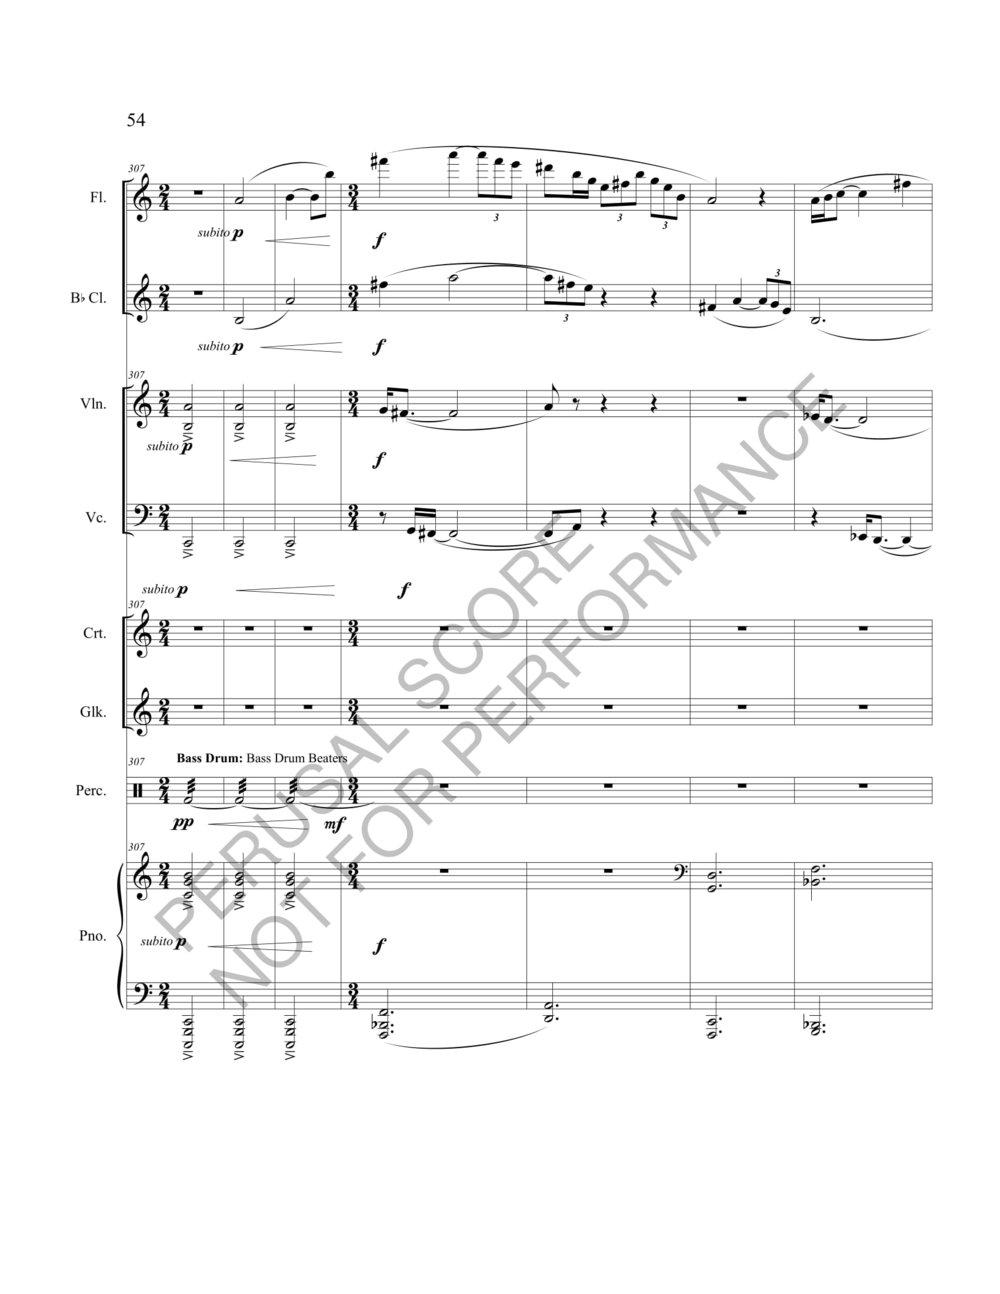 Boyd Terra Liberi Score-watermark-60.jpg